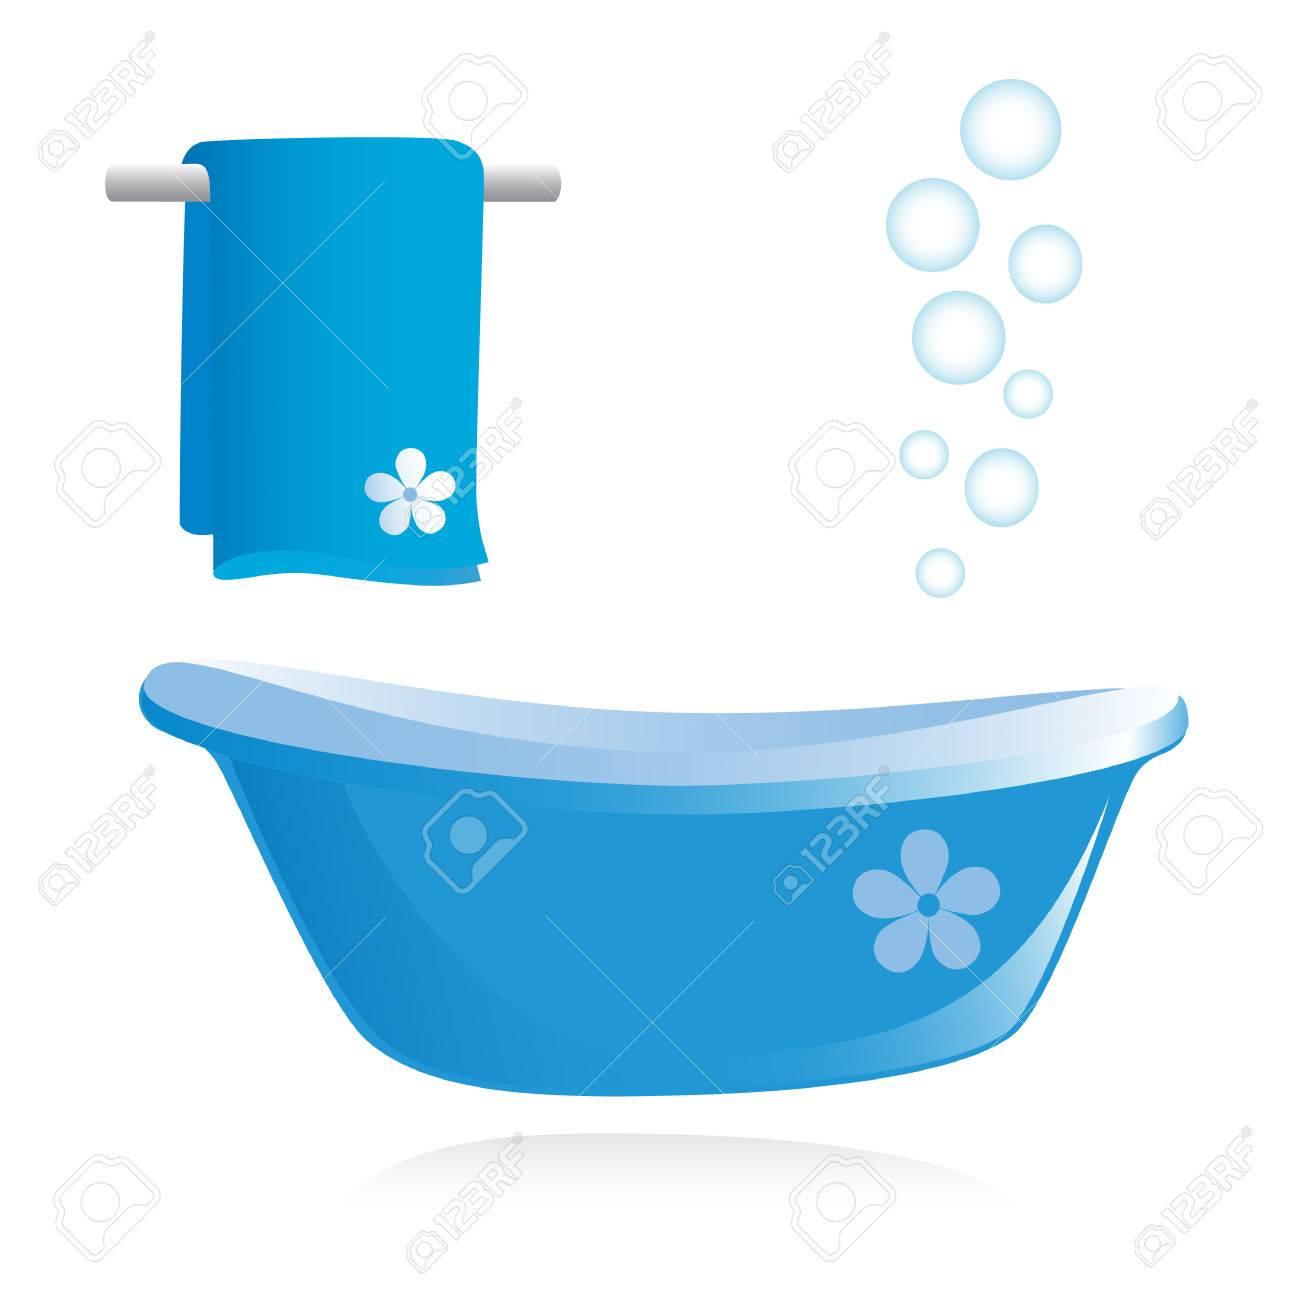 Bathtub and towel. Vector illustration Stock Vector - 3585478